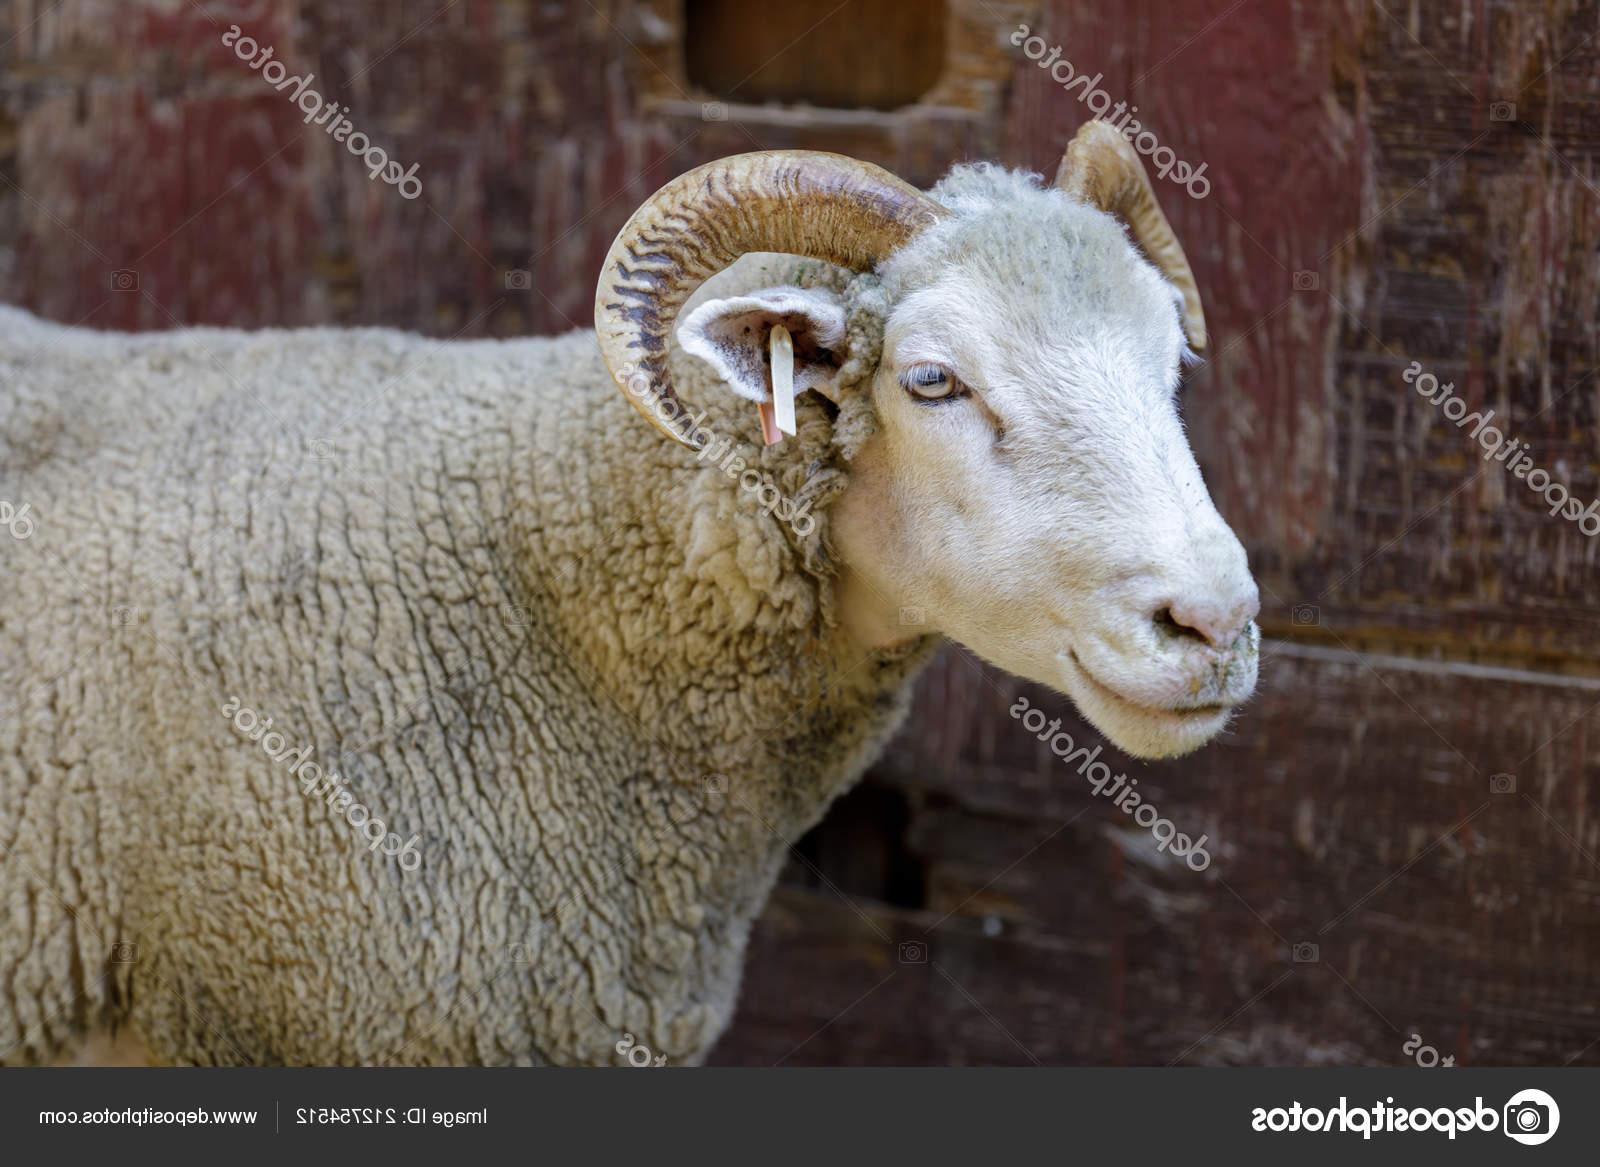 Domestic Sheep (Dorset Horn Breed) Adult. Farm In Northern California, Usa.  212754512 for Gambar Domba Dorset